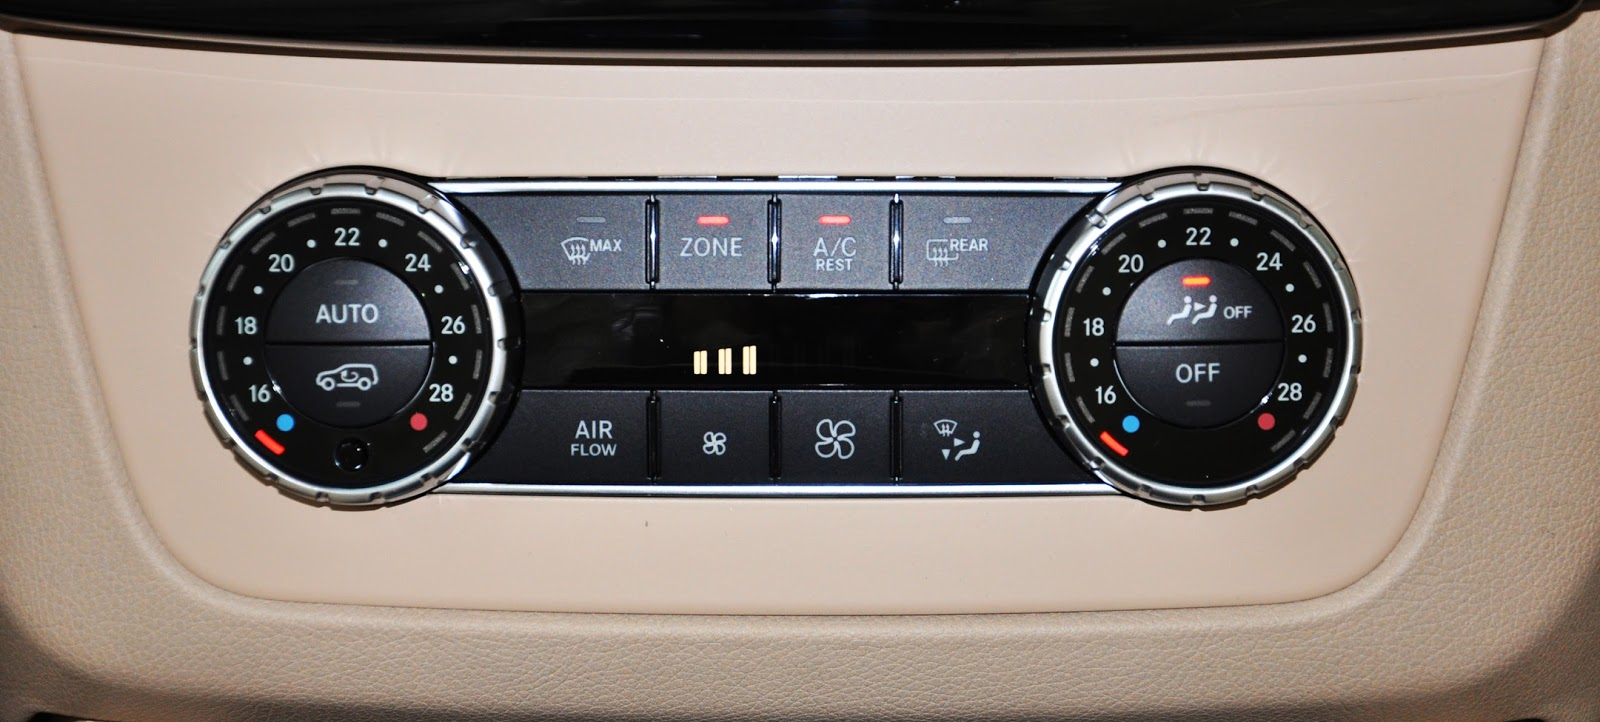 xe Mercedes Benz GLS 400 thế hệ mới 011